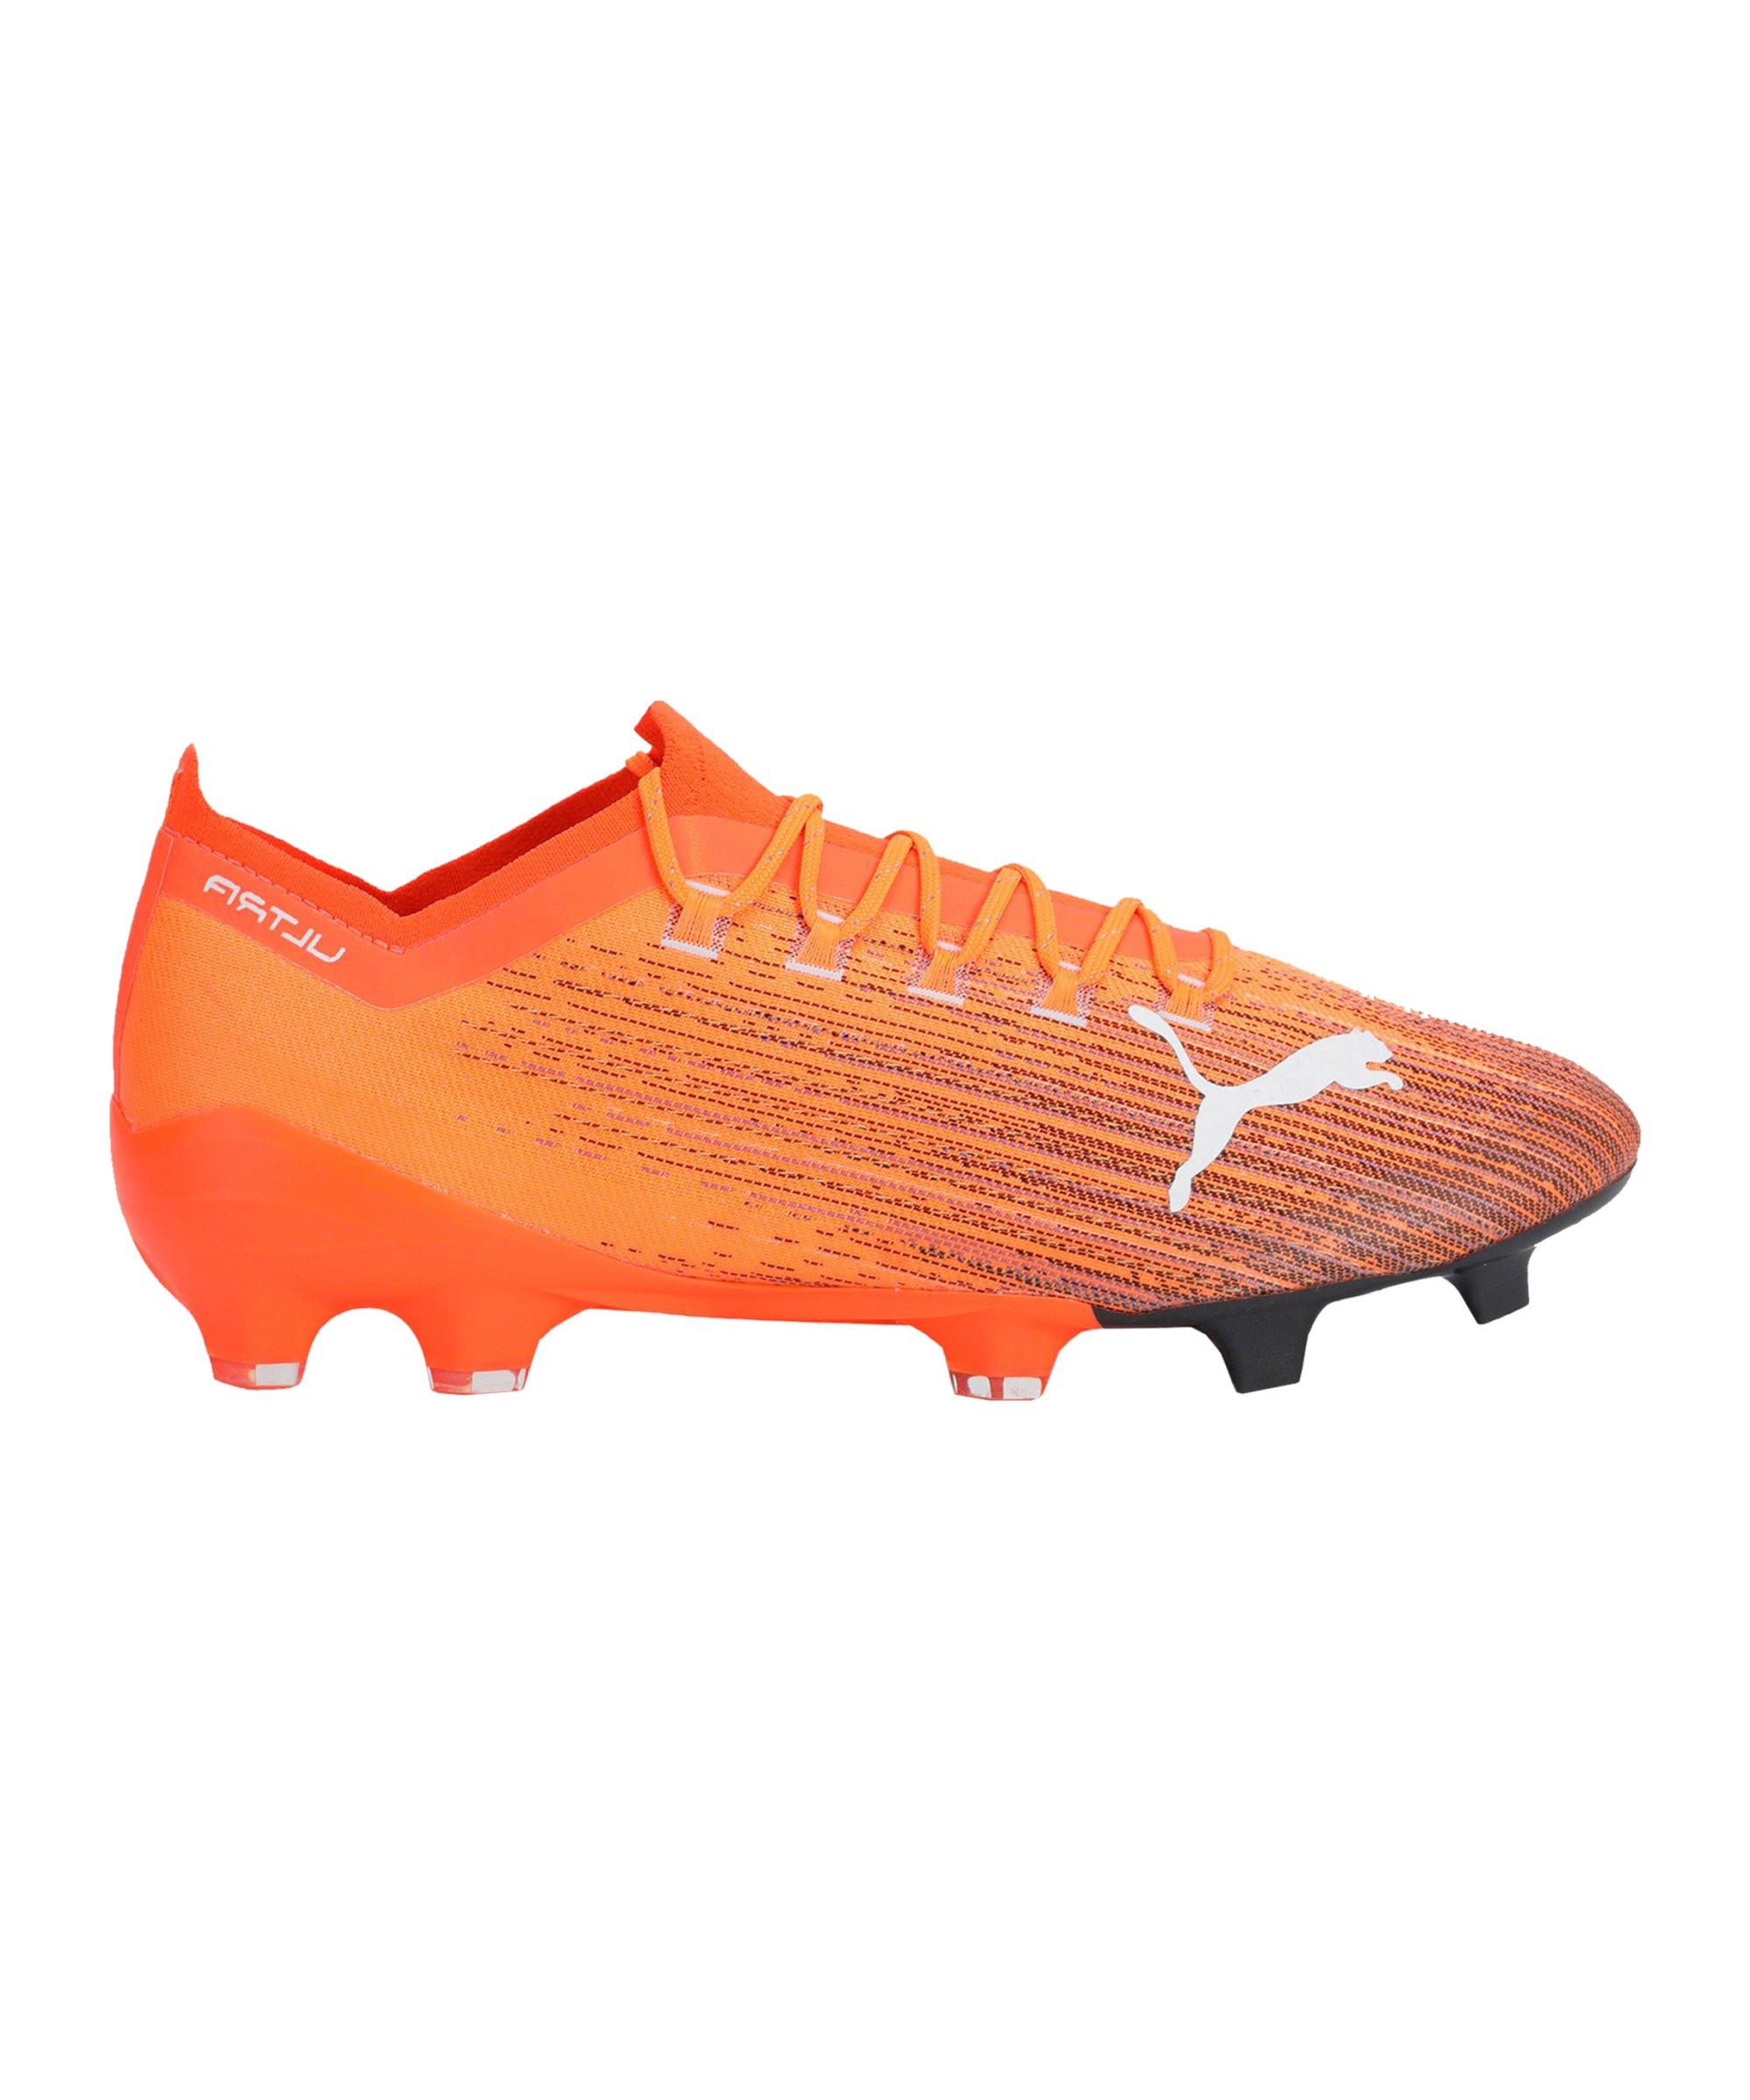 PUMA ULTRA Chasing Adrenaline 1.1 FG/AG Orange F01 - orange